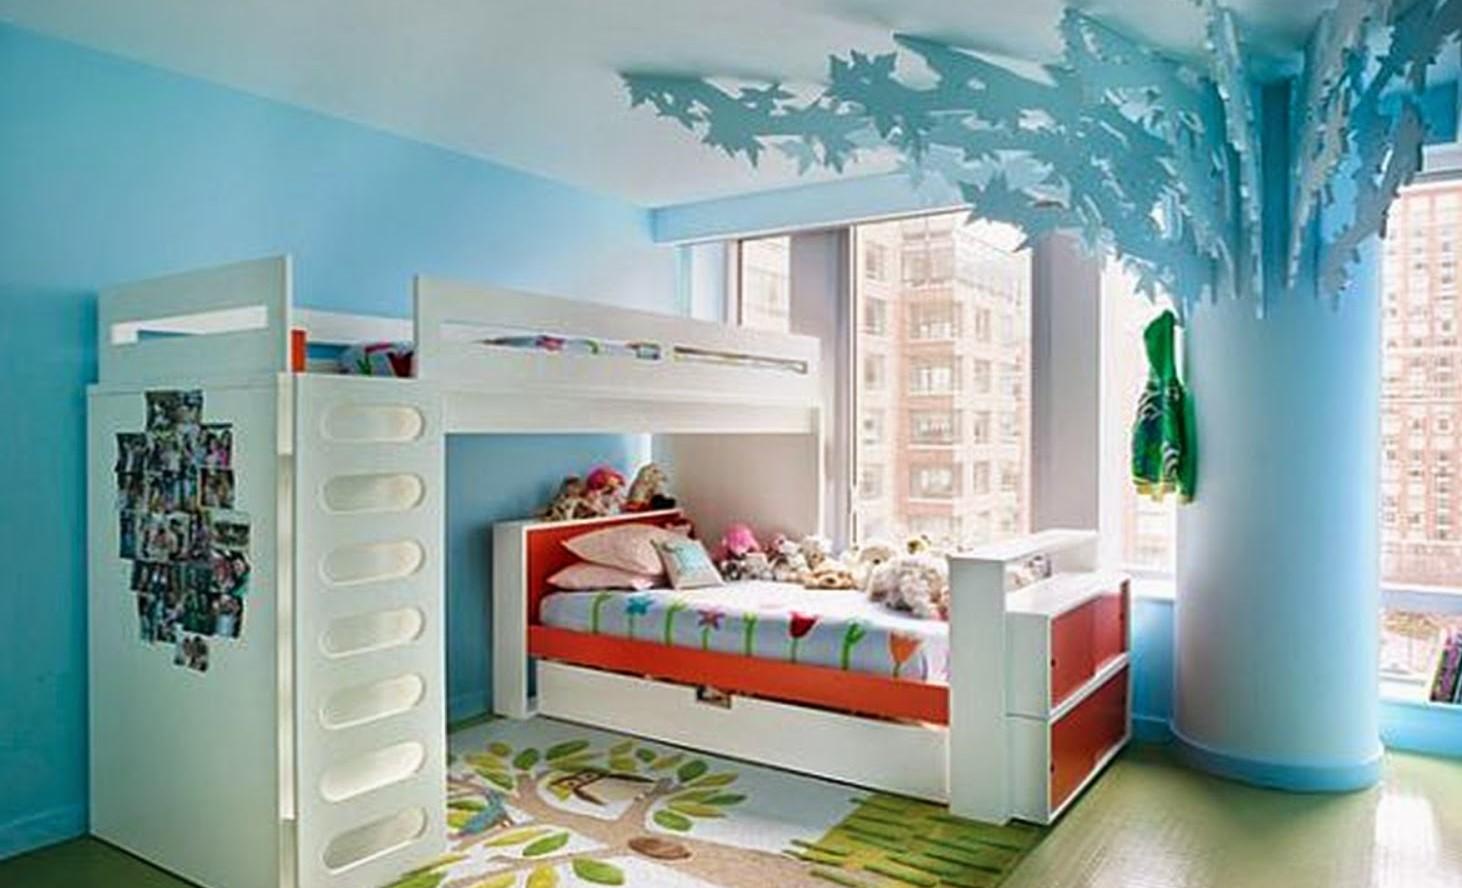 √ 33 desain kamar tidur frozen paling cantik dan feminim terbaru